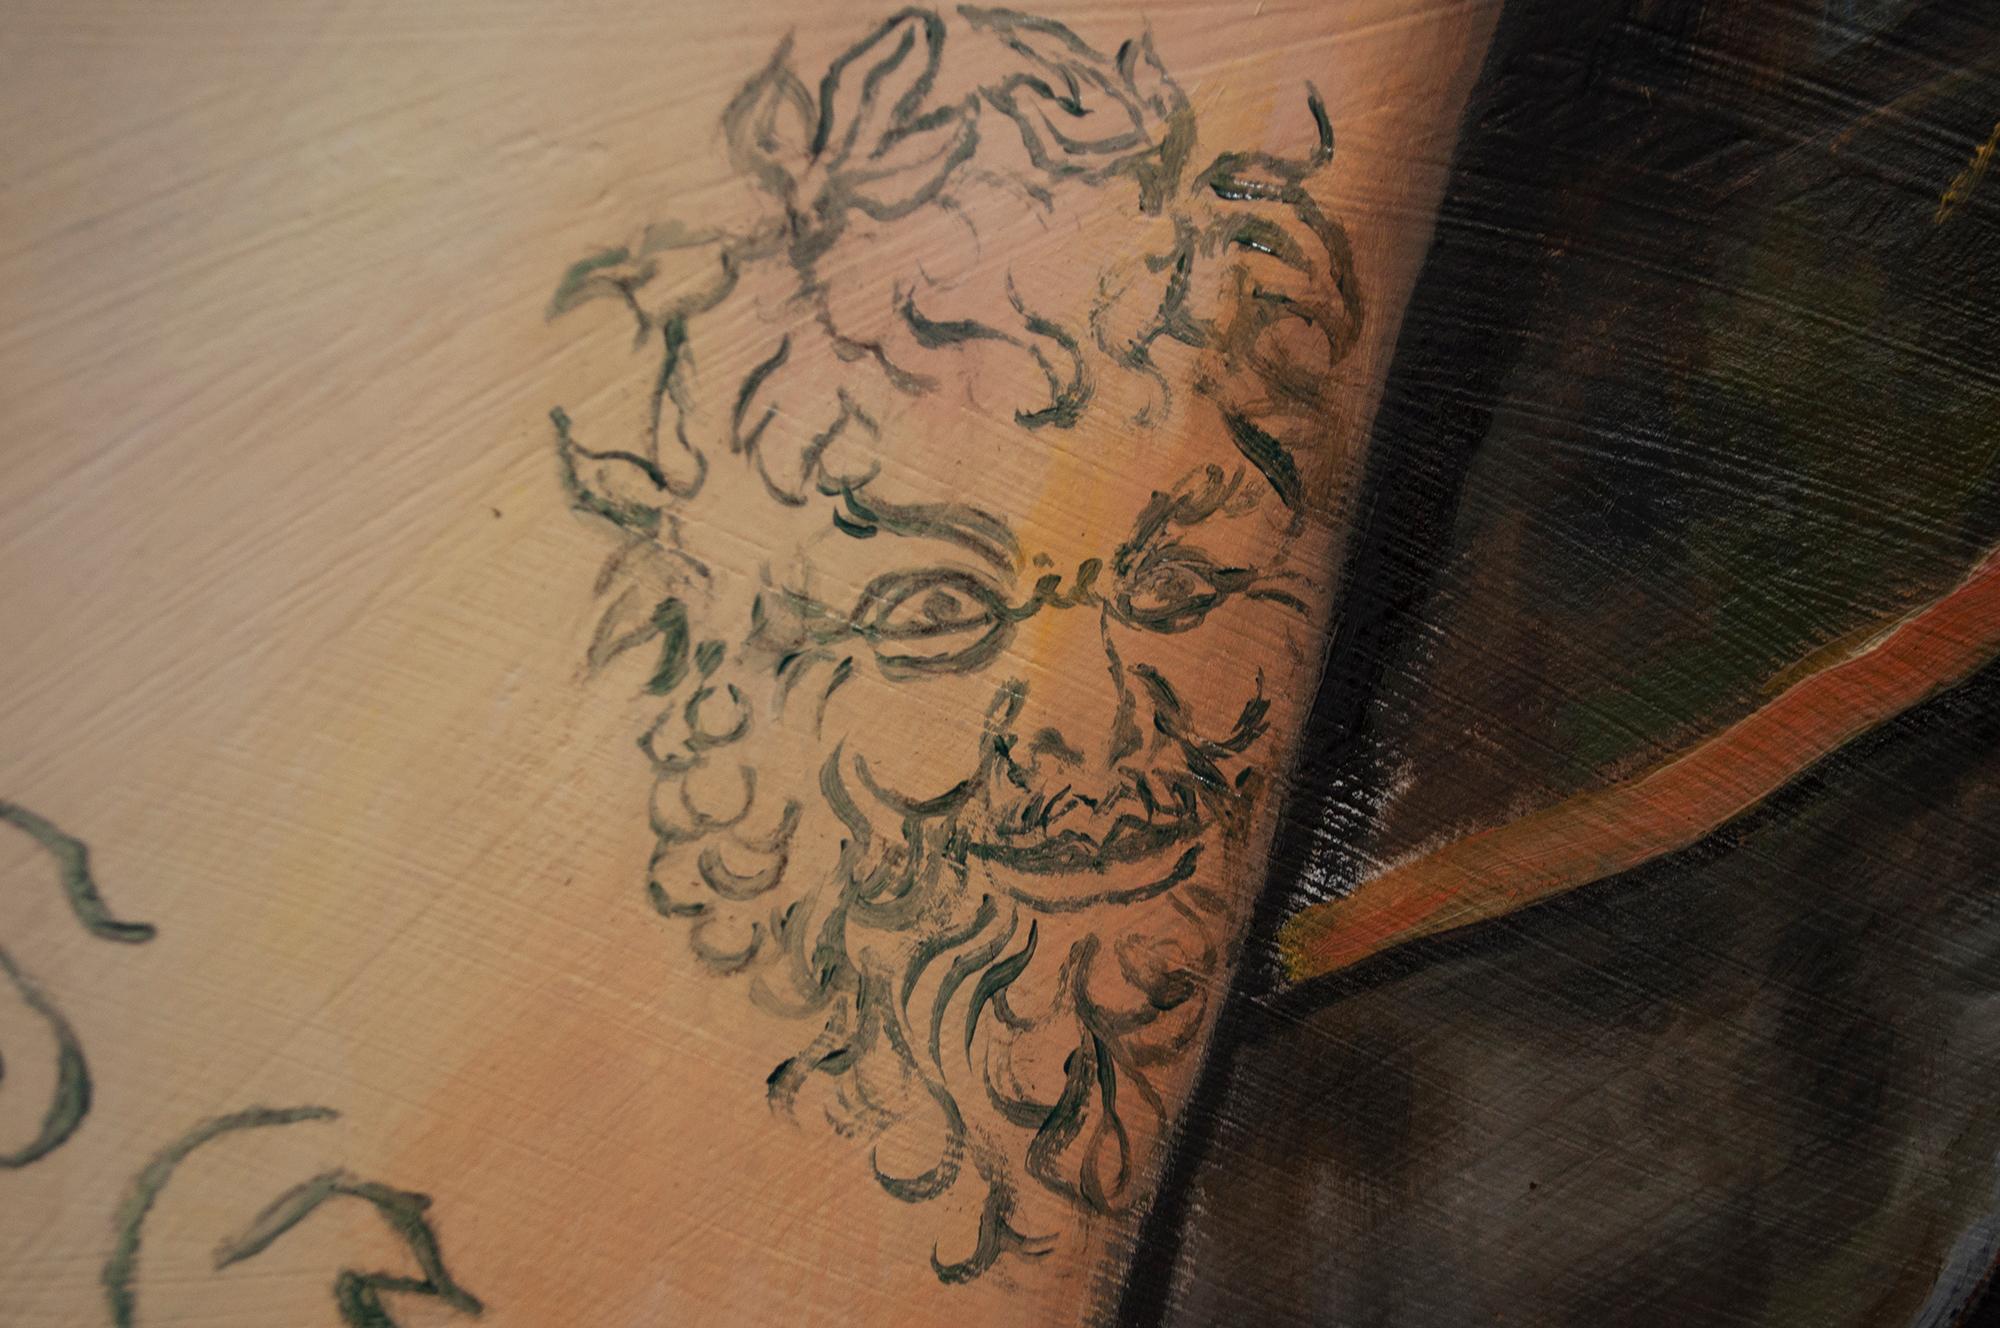 Bacchus/Dionysus, god of wine